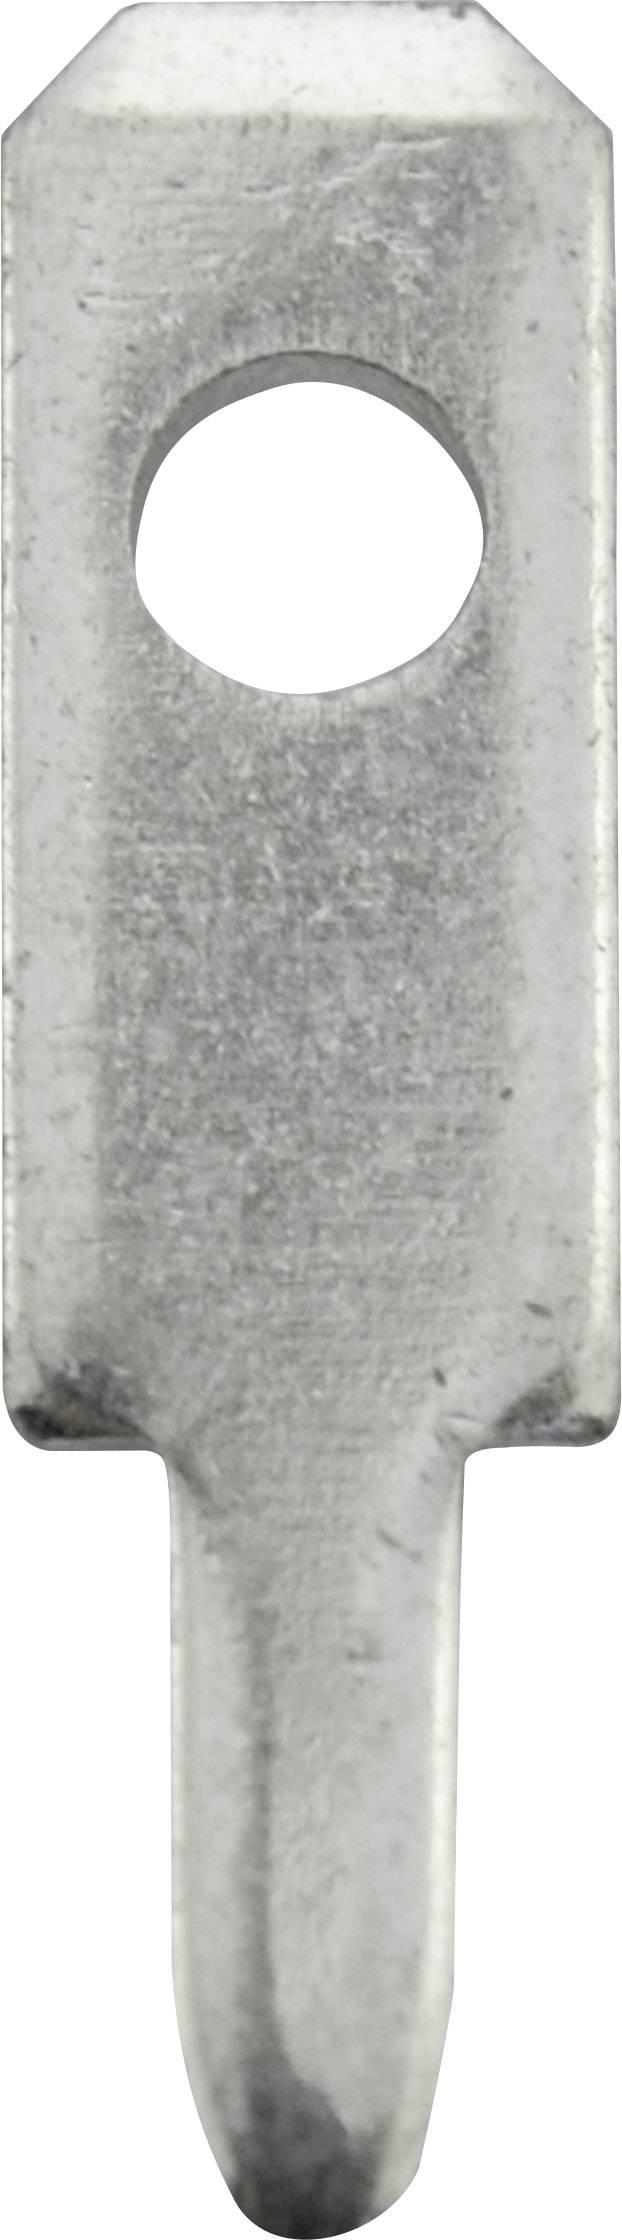 Faston zástrčka Vogt Verbindungstechnik 378708.68 2.8 mm x 0.8 mm, 90 °, bez izolace, kov, 100 ks